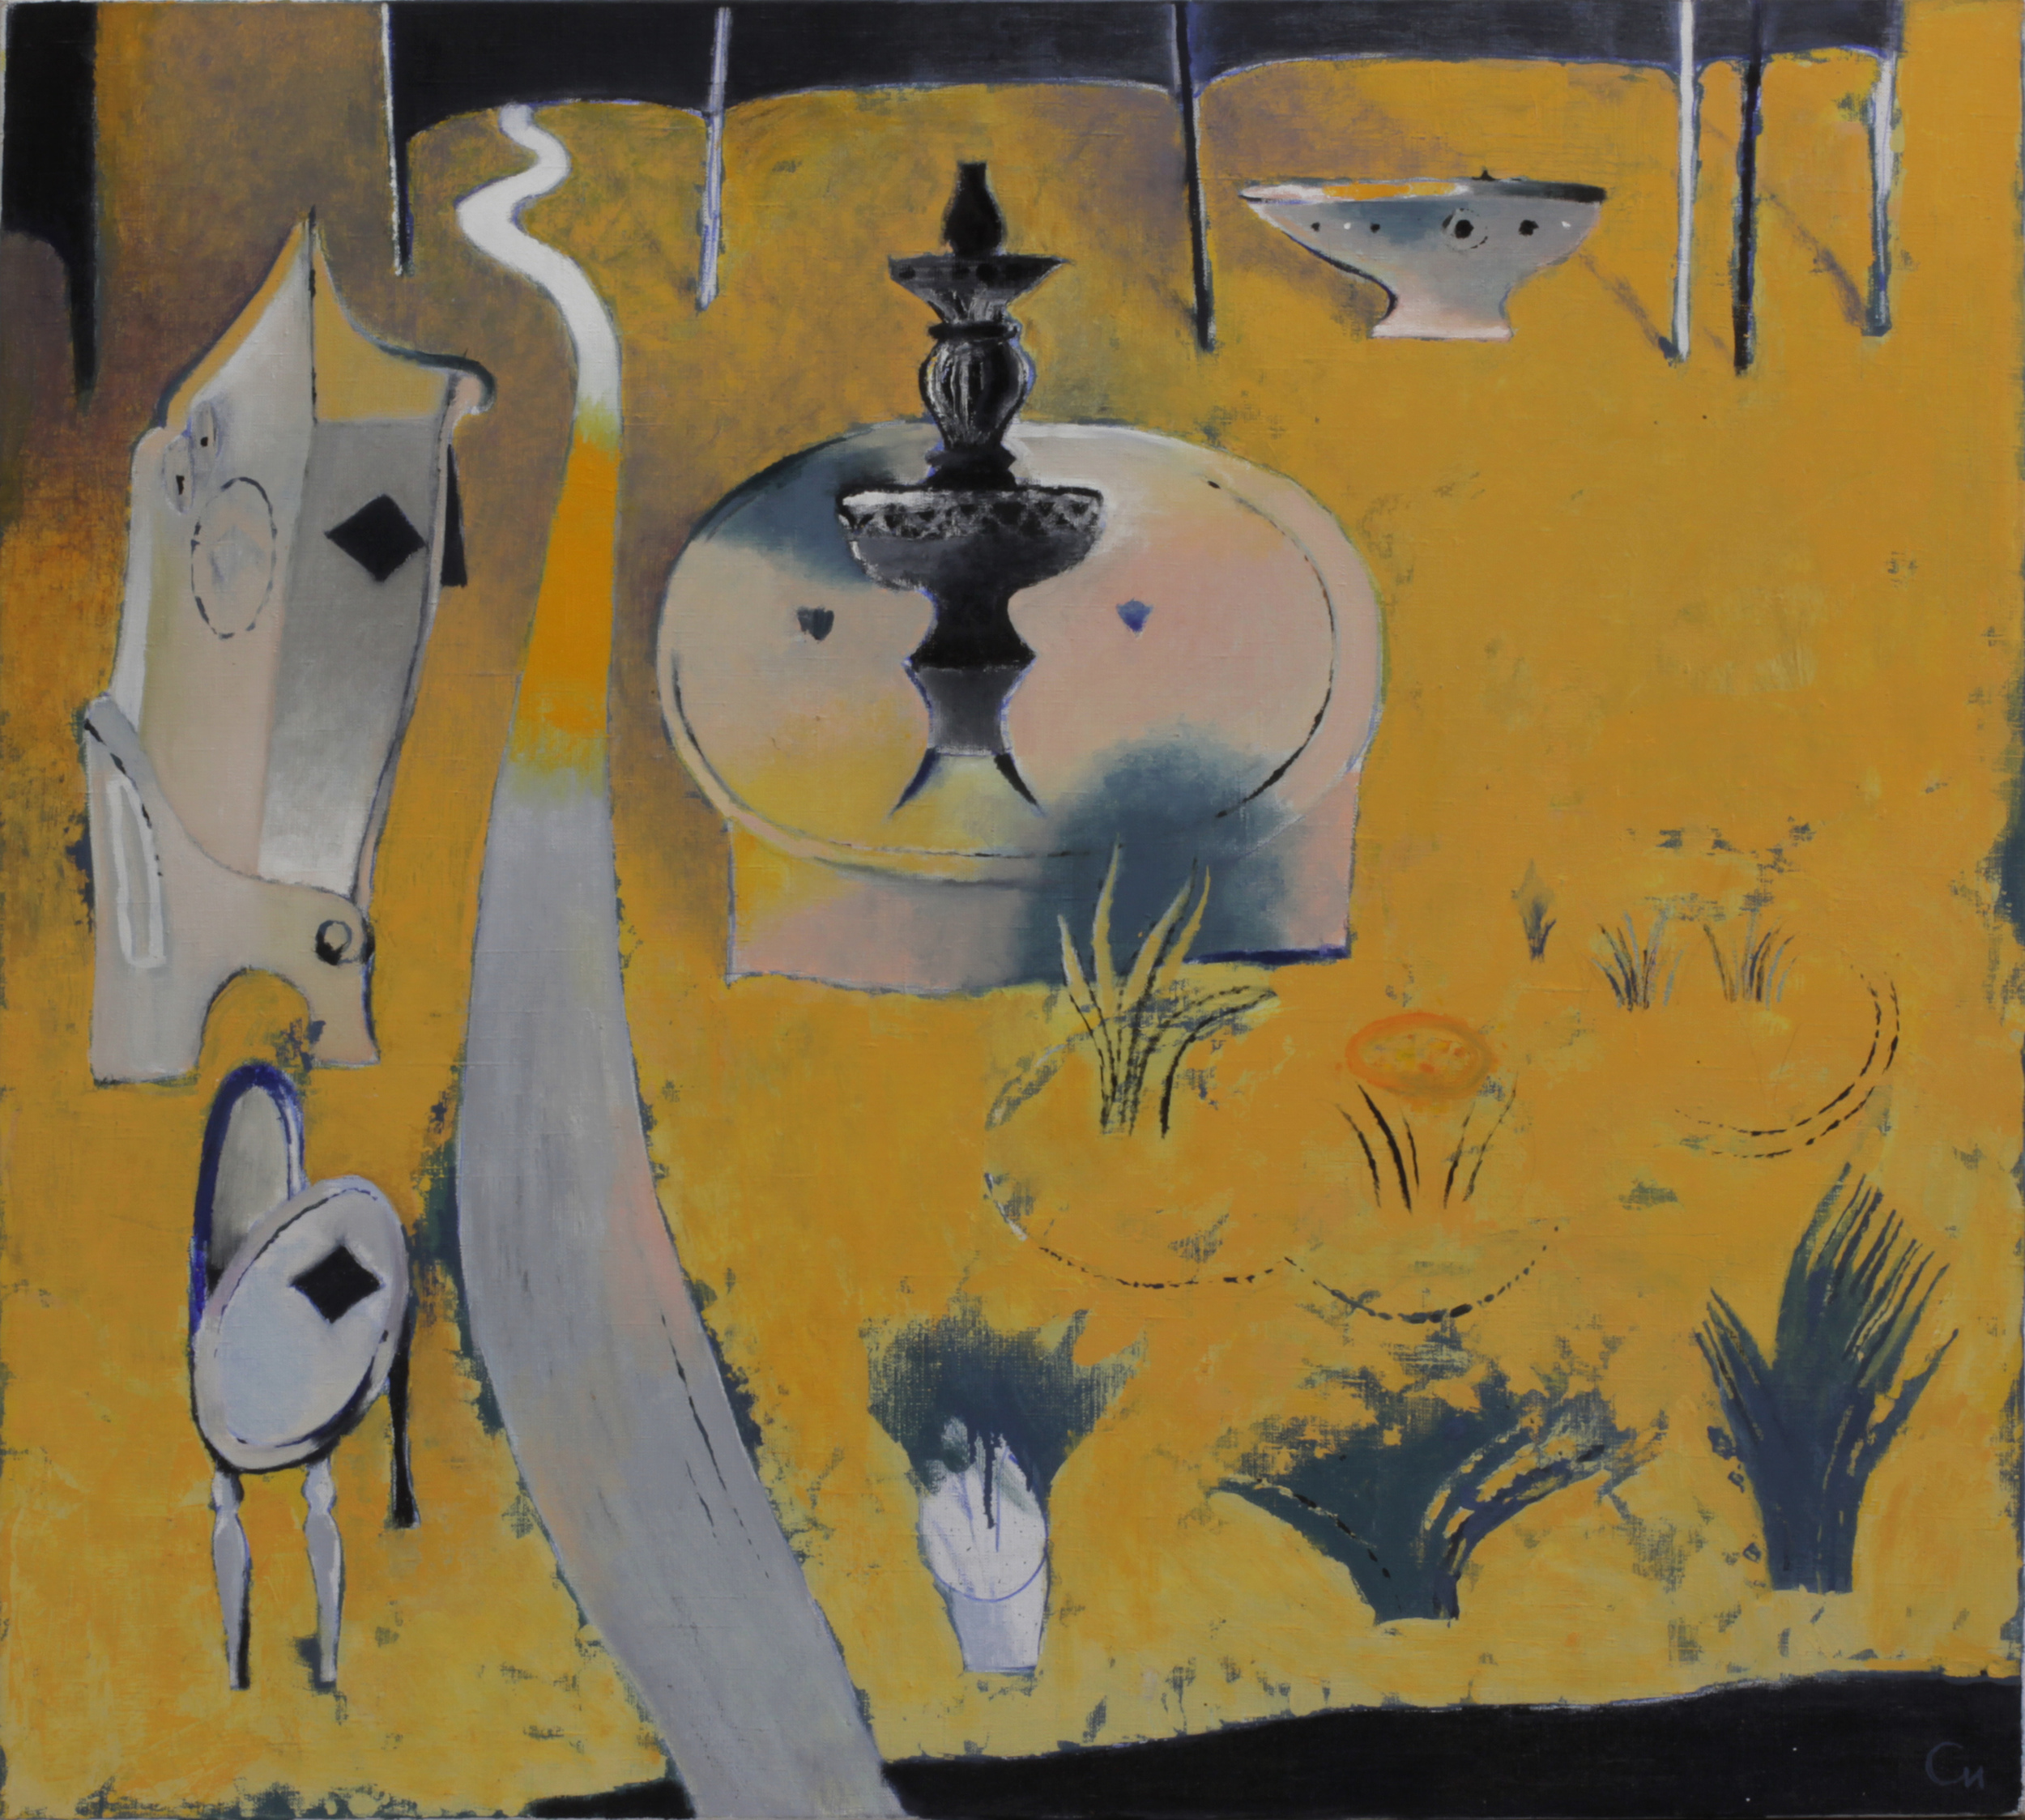 Kadzi Sai 3, 2014, Oil on Canvas, 36 x 39 in (90 х 100 cm)